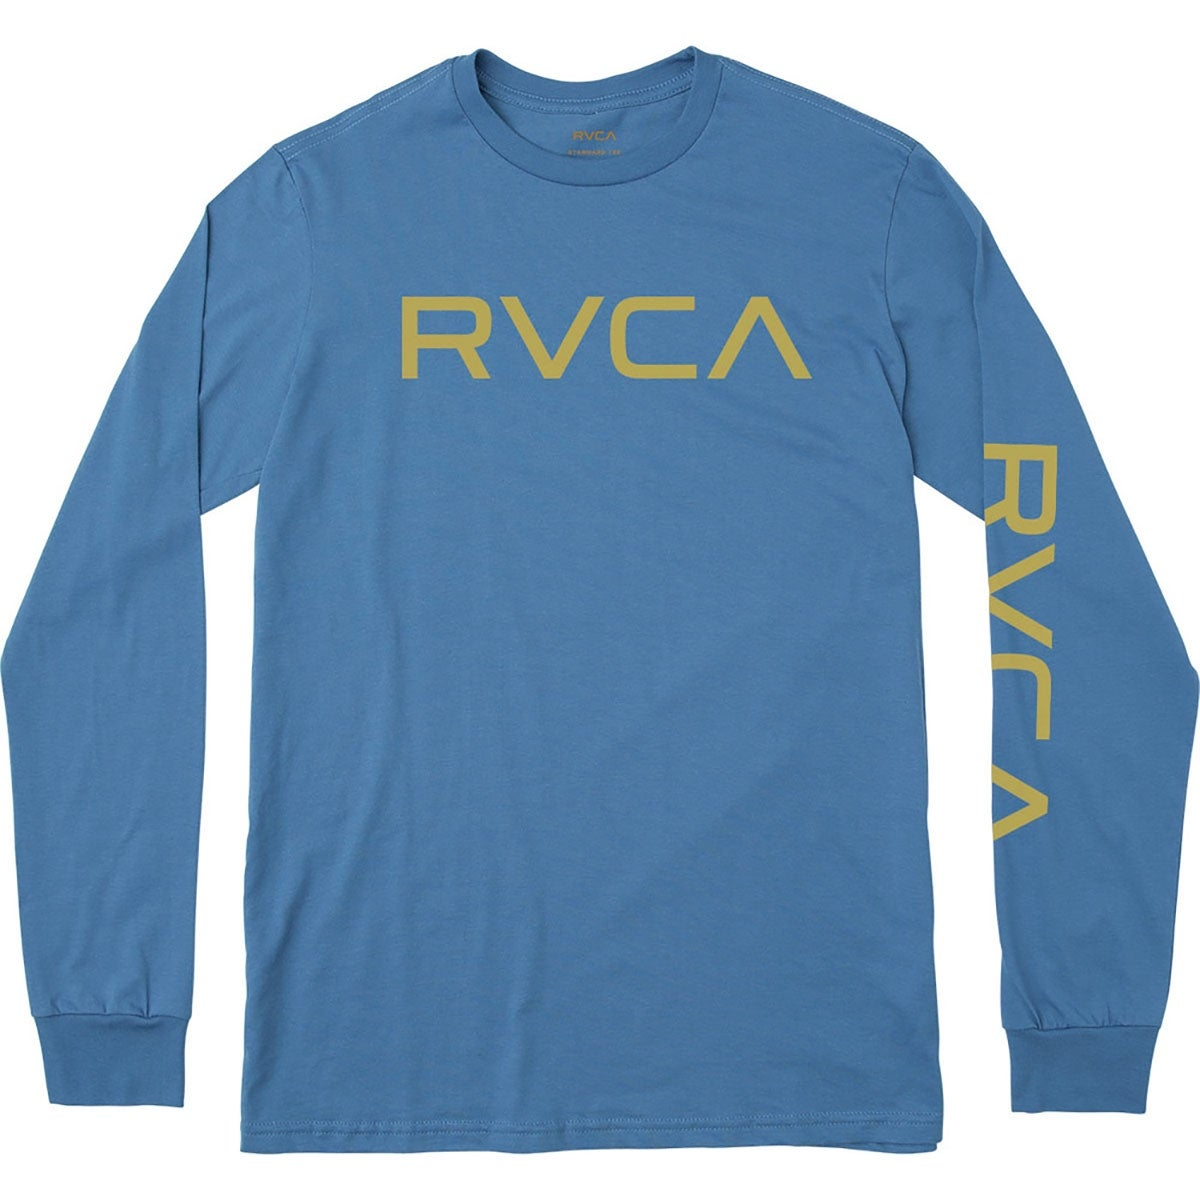 RVCA Managed Jacket - Black